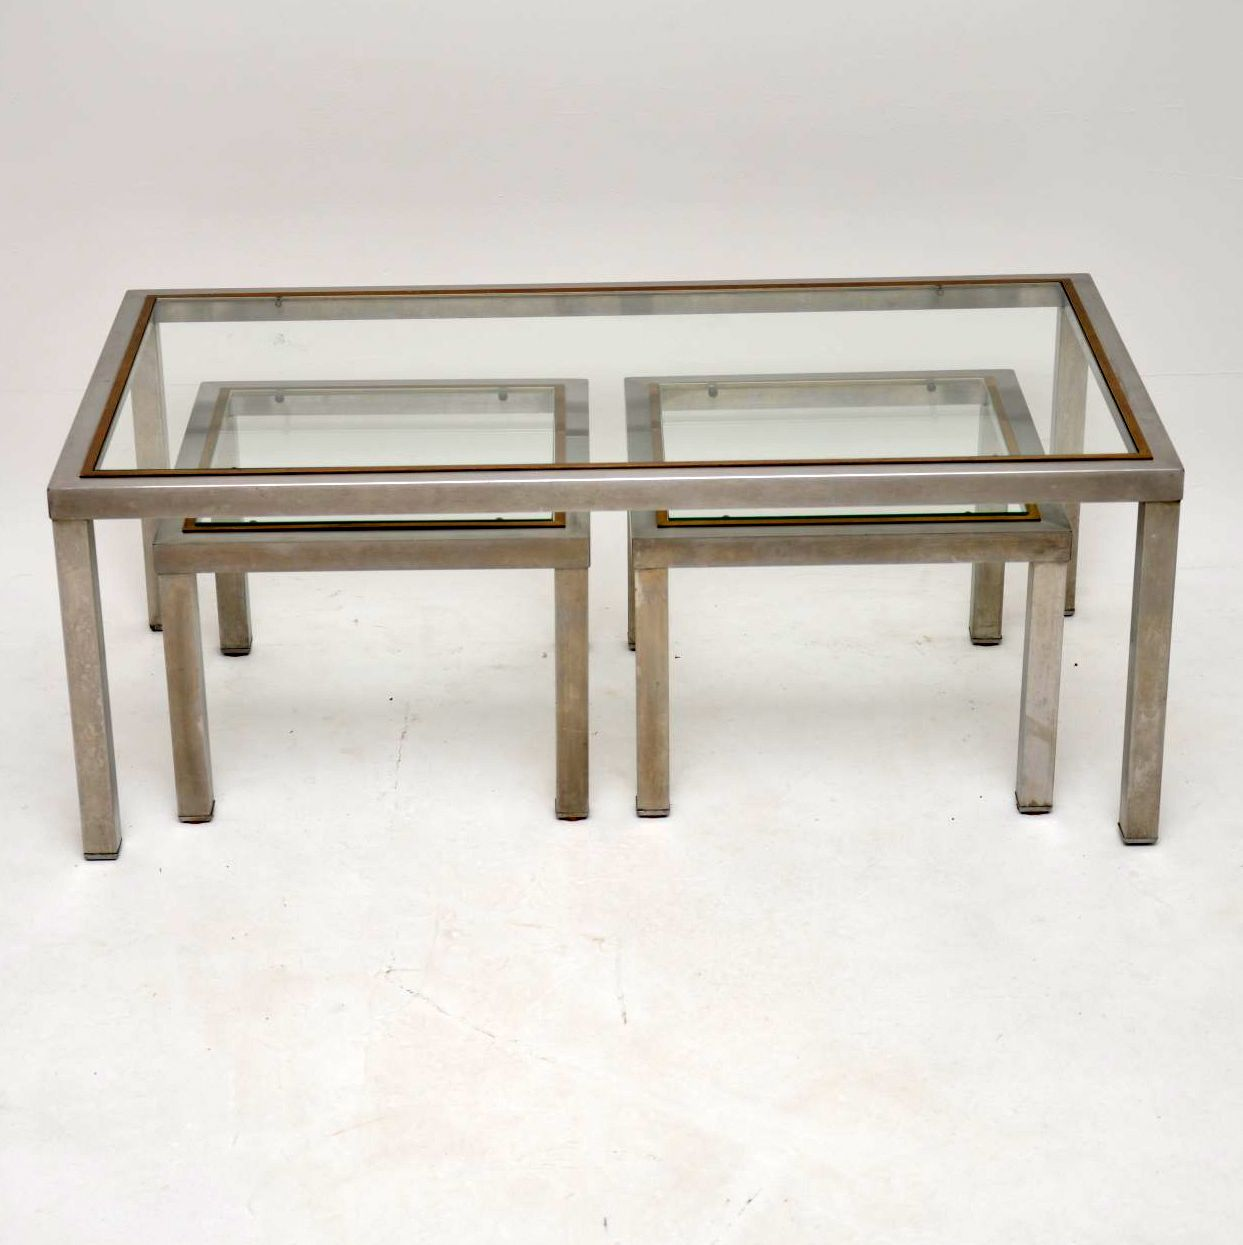 retro_chrome_brass_nestring_coffee_table_2